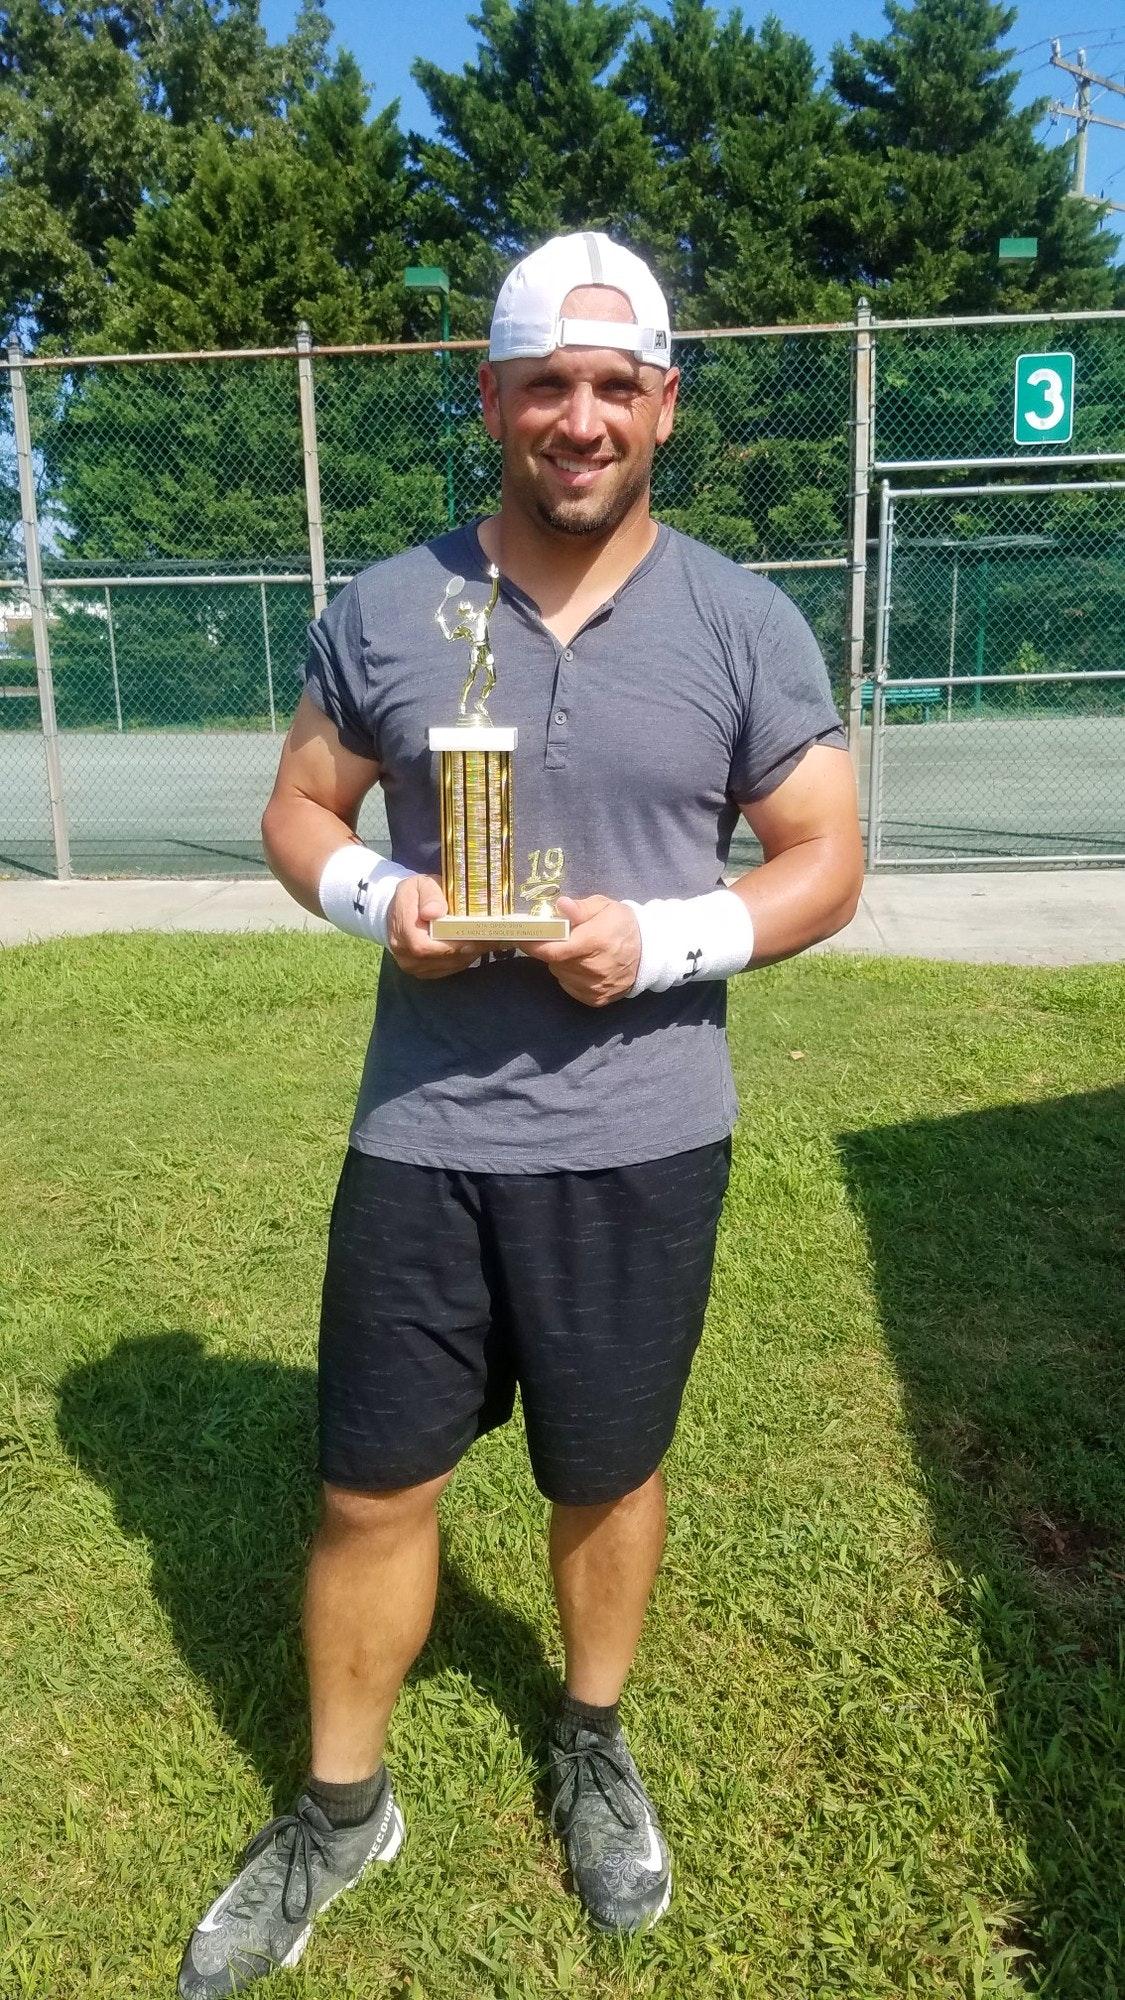 Matthew R. teaches tennis lessons in Boykins, VA